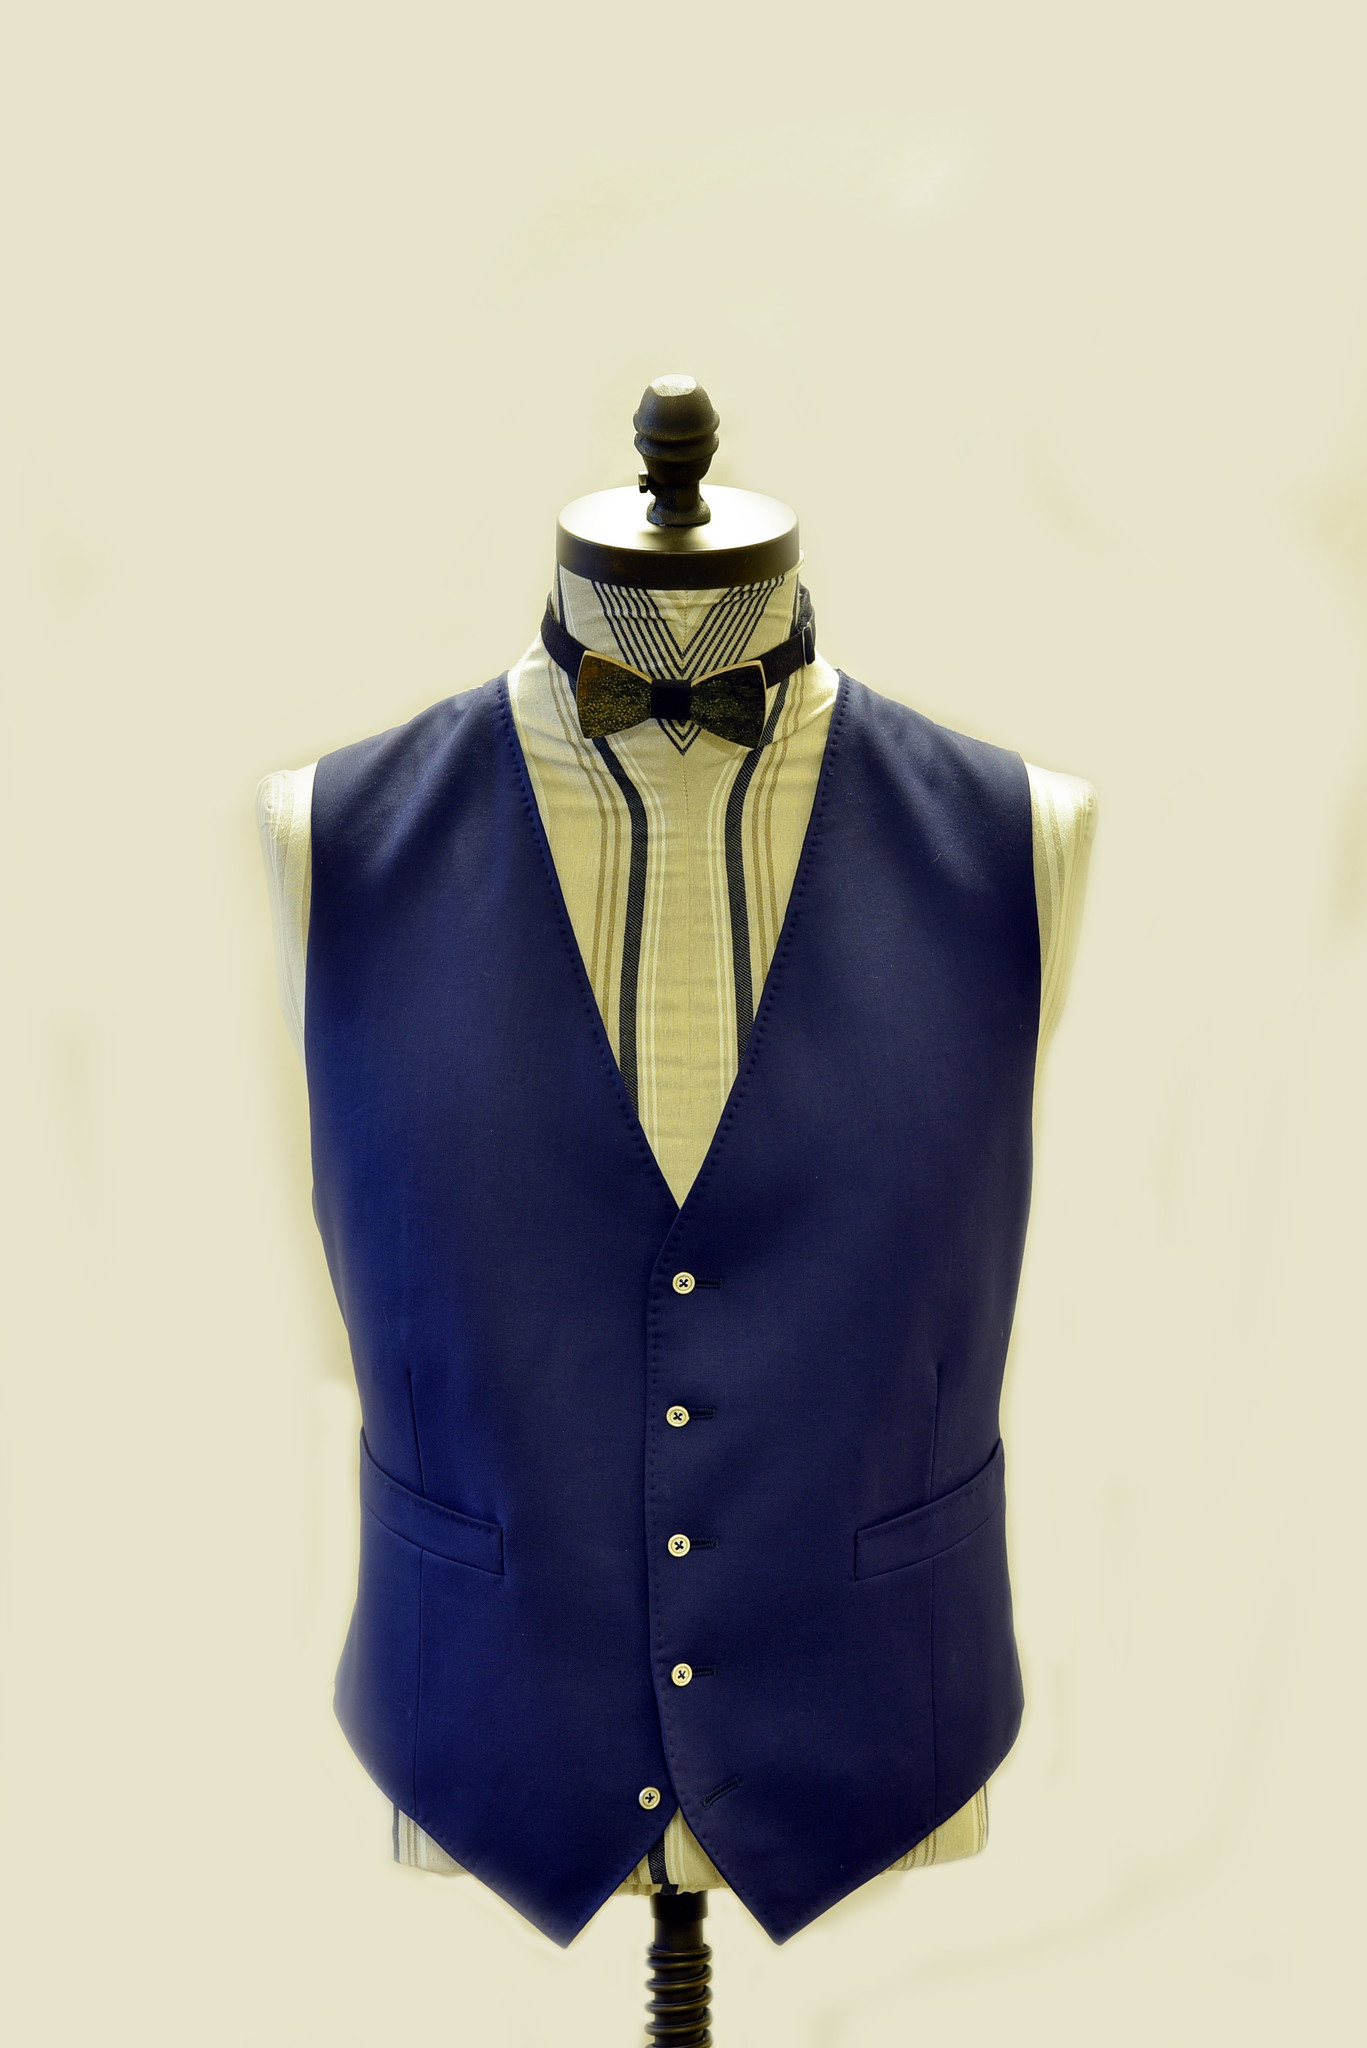 Aravinda  Rodenburg Bespoke tailoring gilet - Aravinda Rodenburg